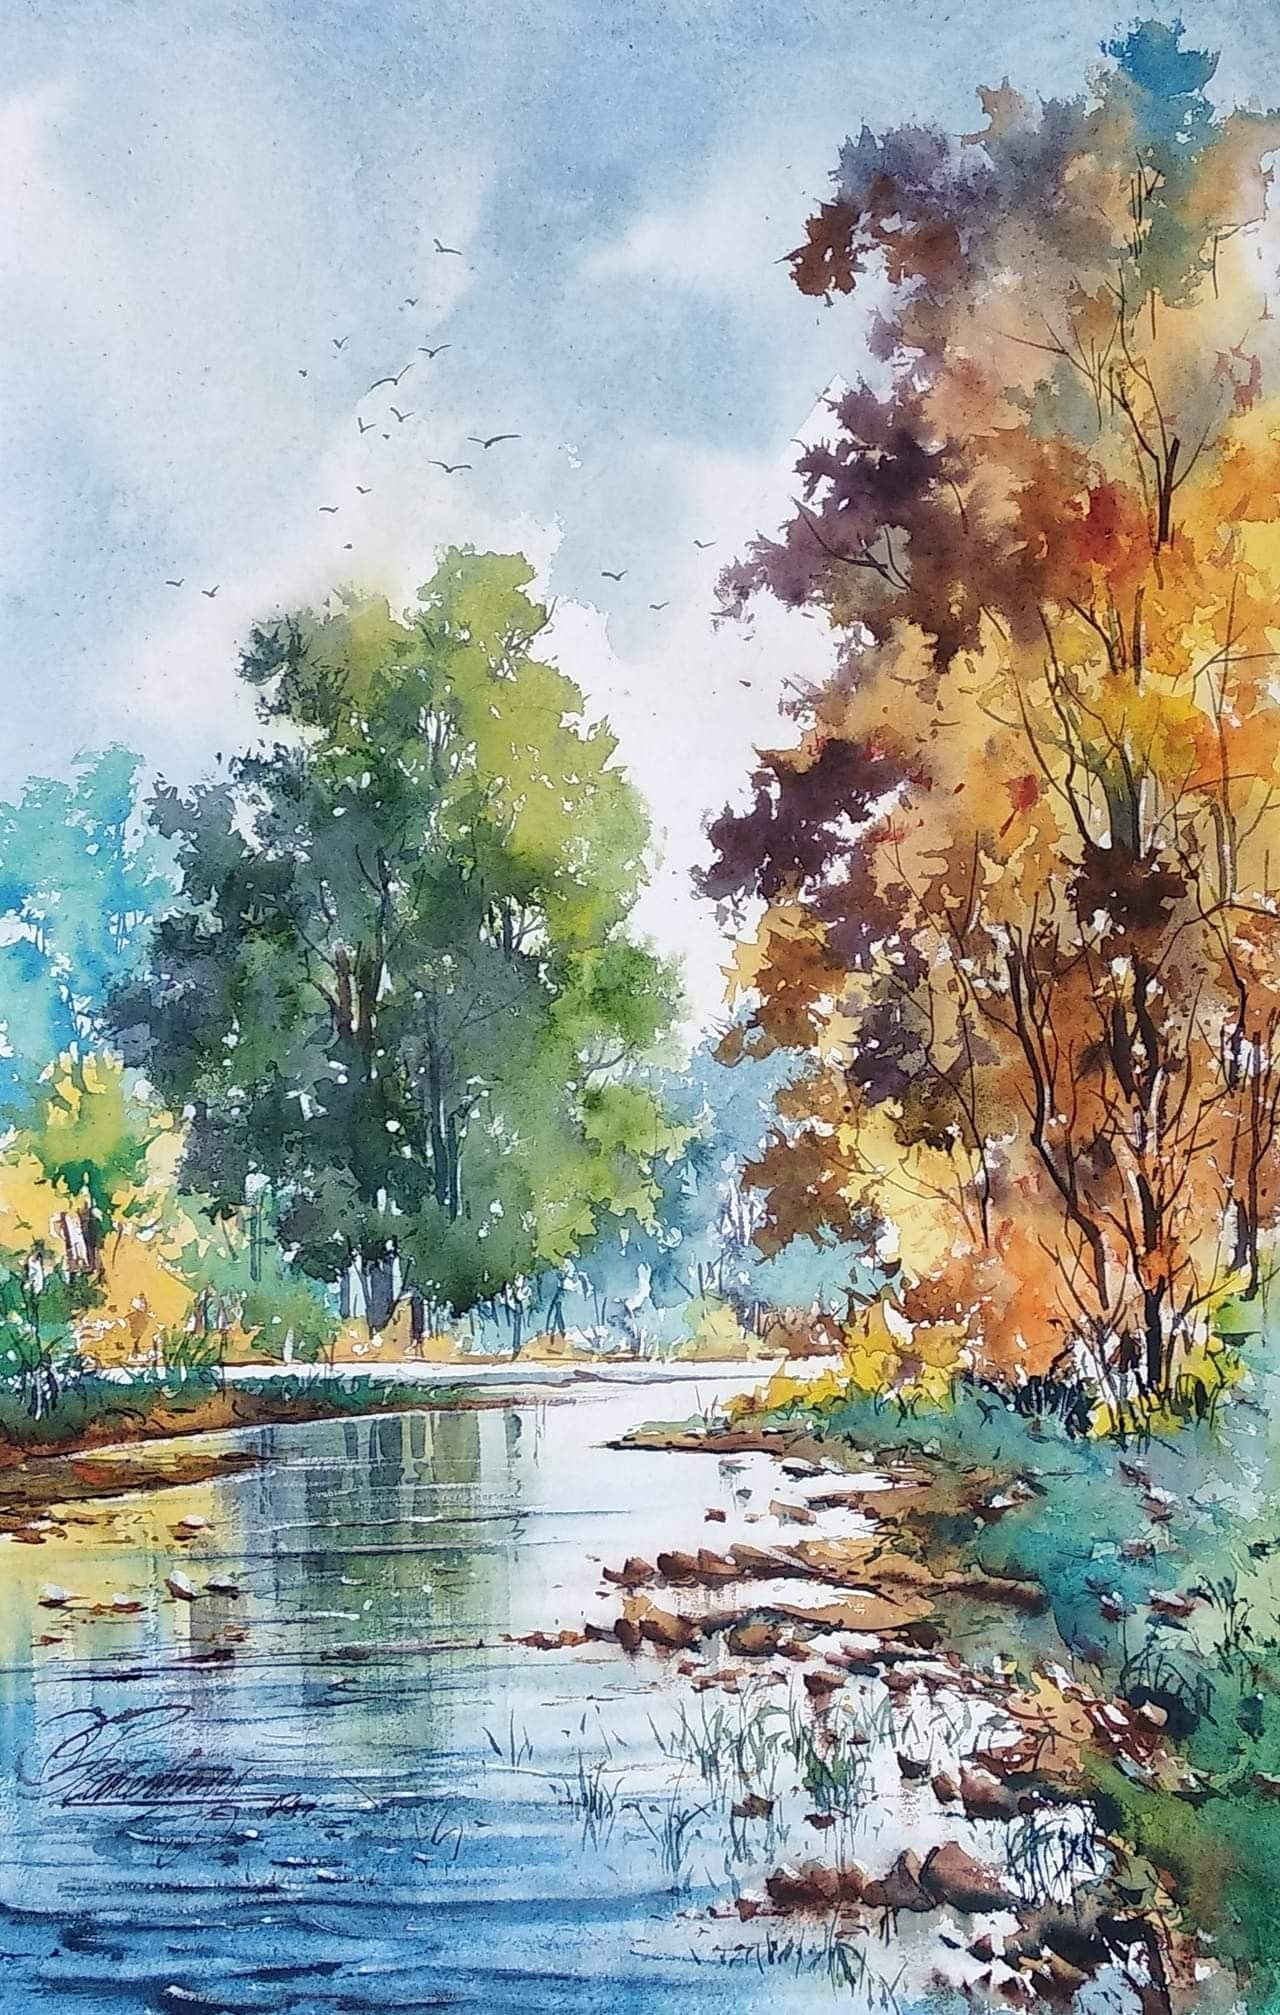 Water Color Painting Saved By Jayant Deshpande In Painting Resim Sanati Resimler Suluboya Cicekler